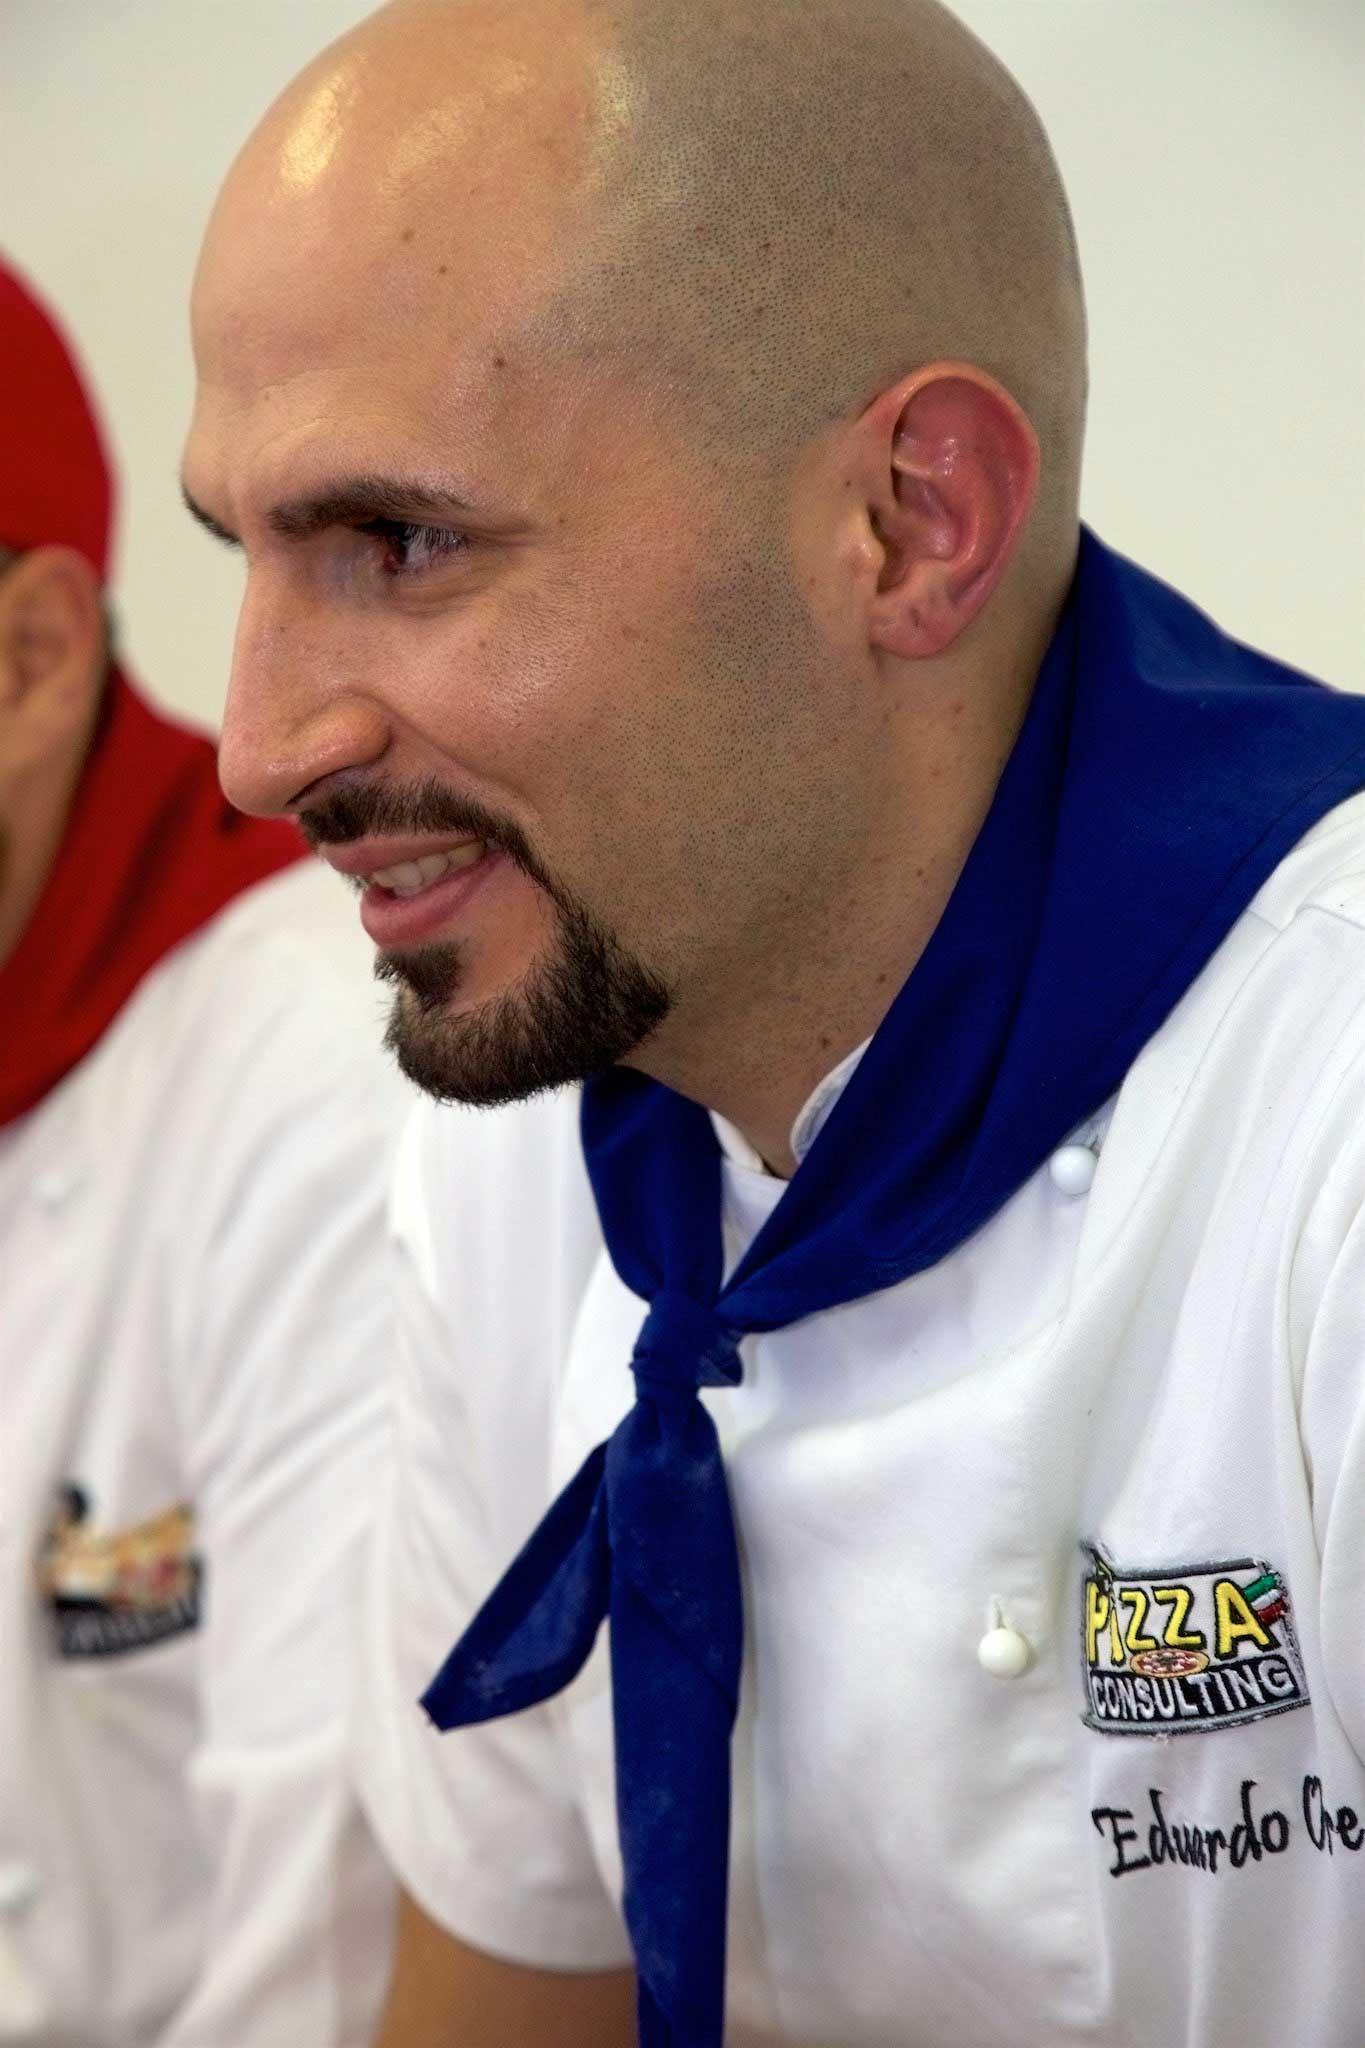 Eduardo Ore pizzaiolo